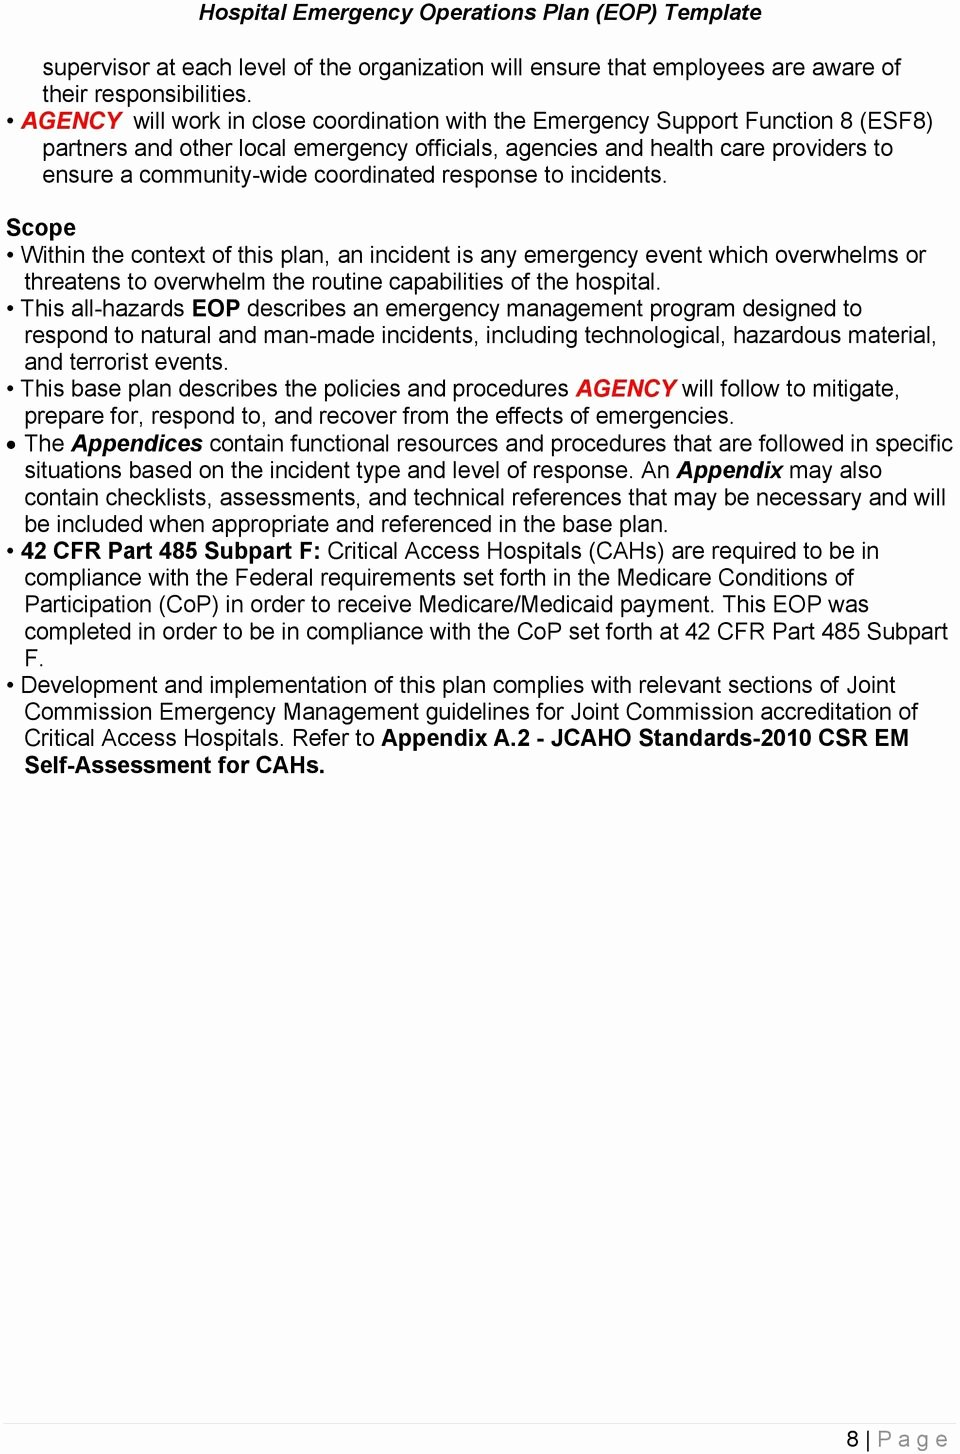 Hospital Emergency Preparedness Plan Template Fresh Hospital Emergency Operations Plan Eop Template Pdf